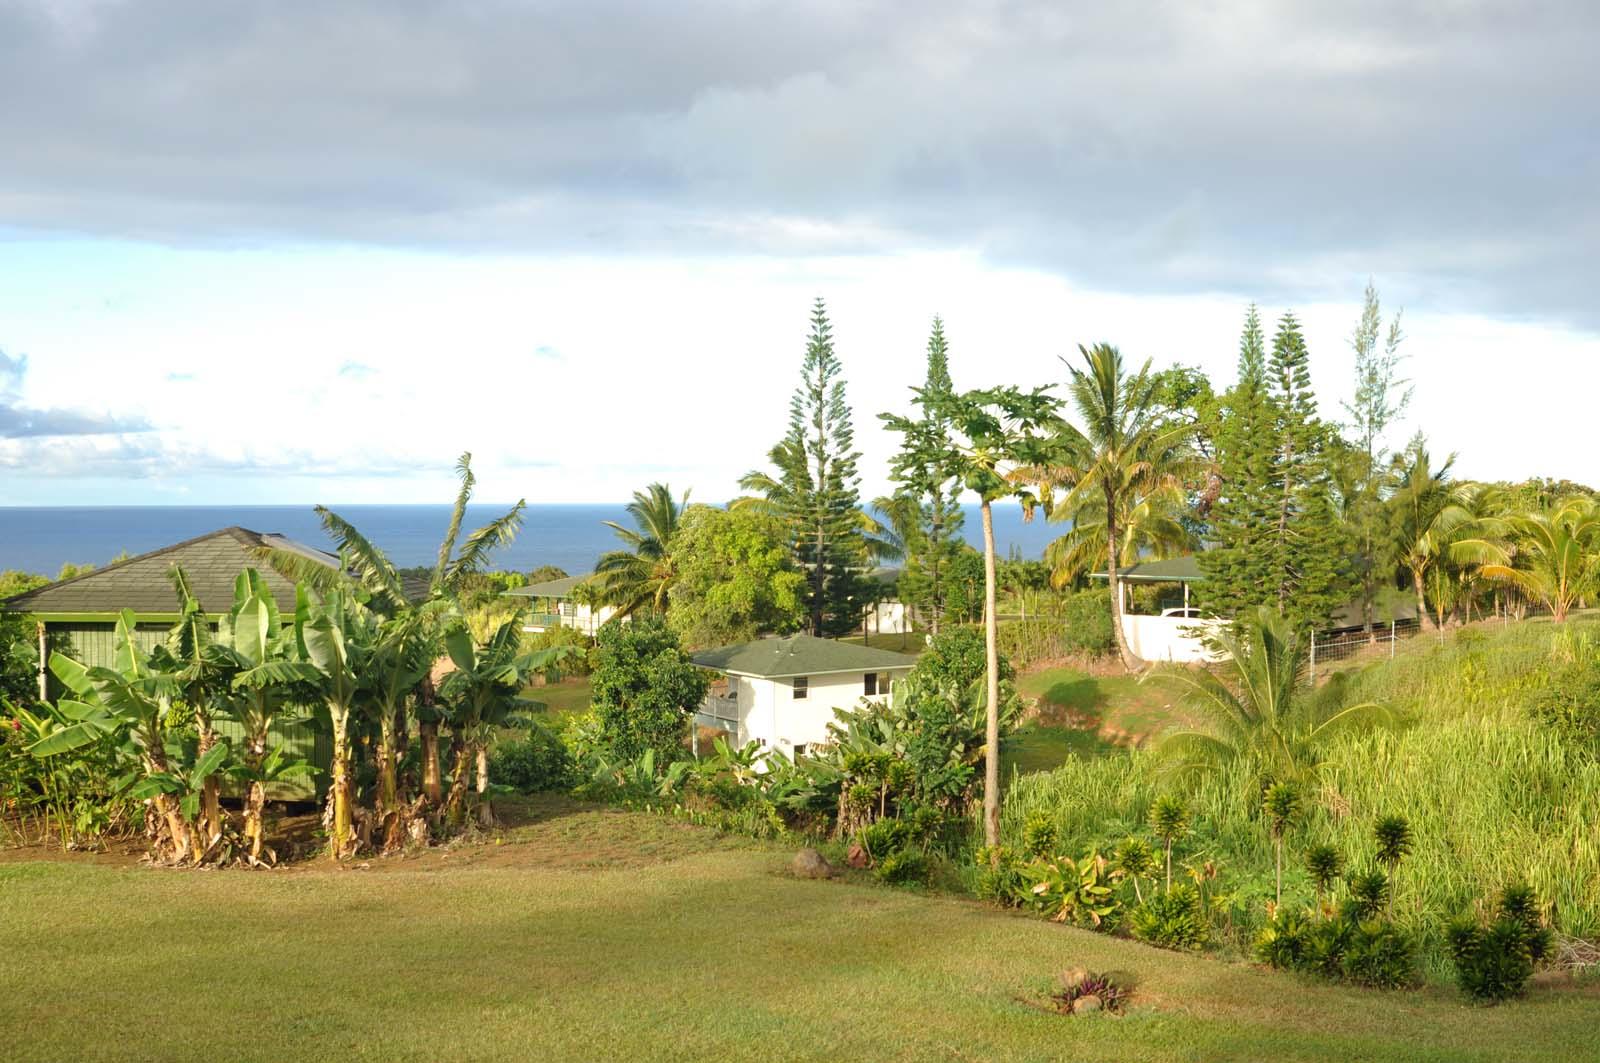 048_maui_hawaii_island